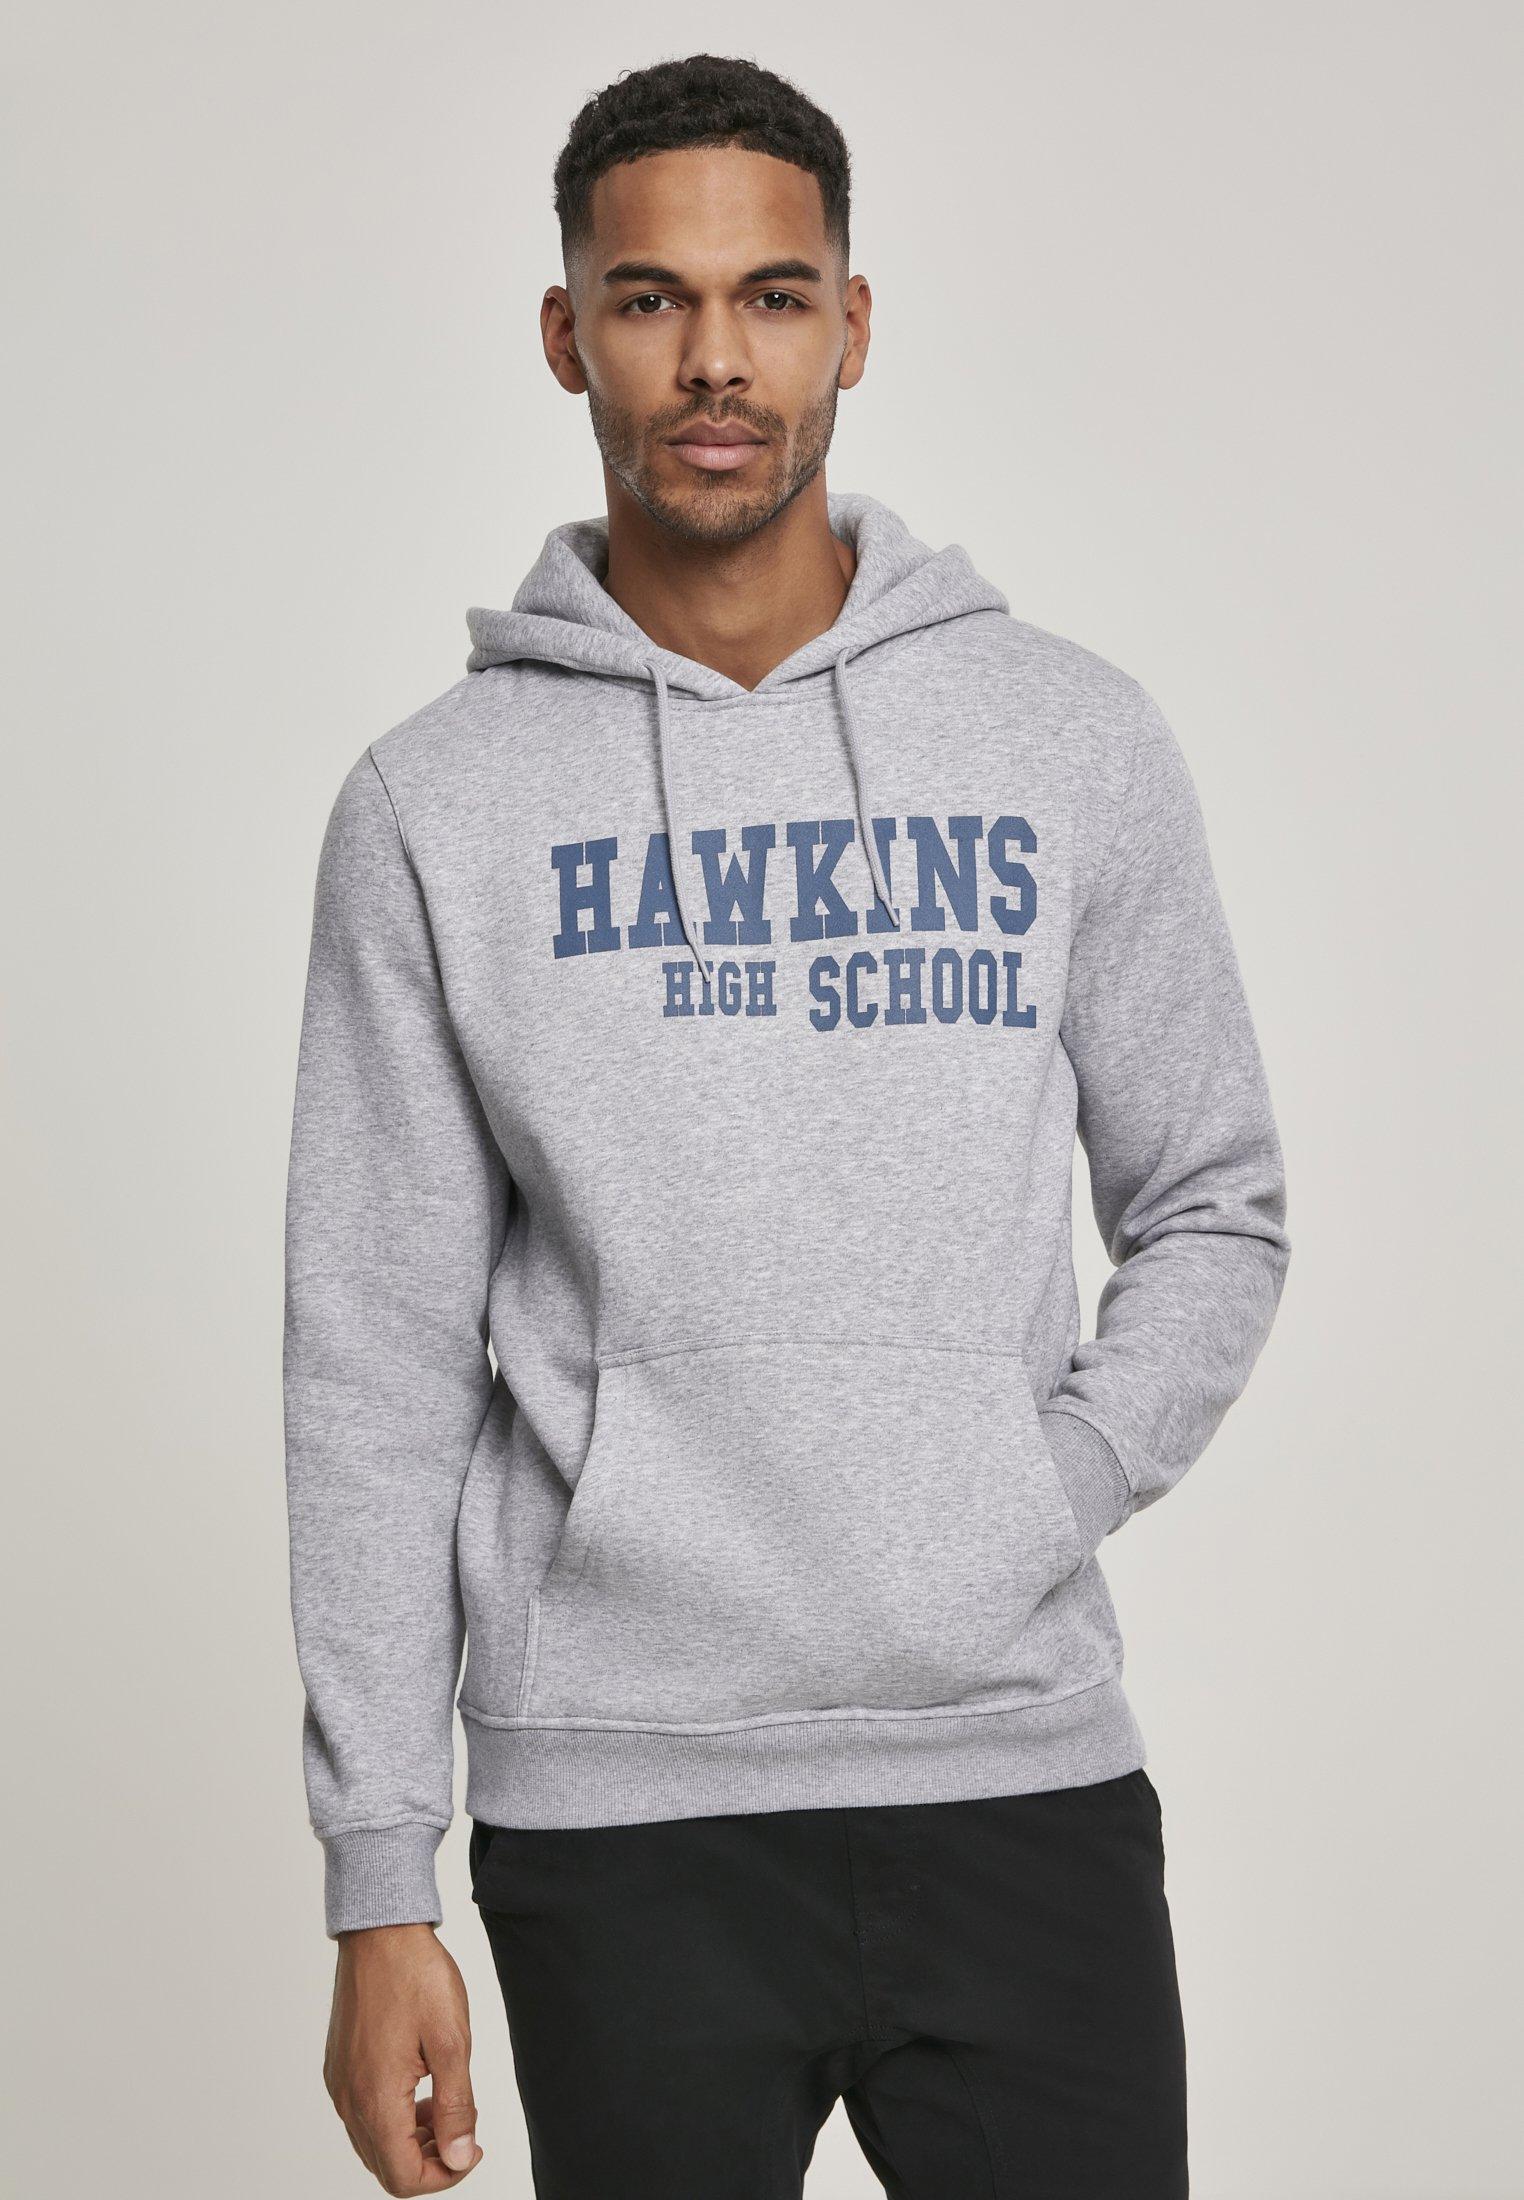 Homme HAWKINS HIGHSCHOOL - Sweat à capuche